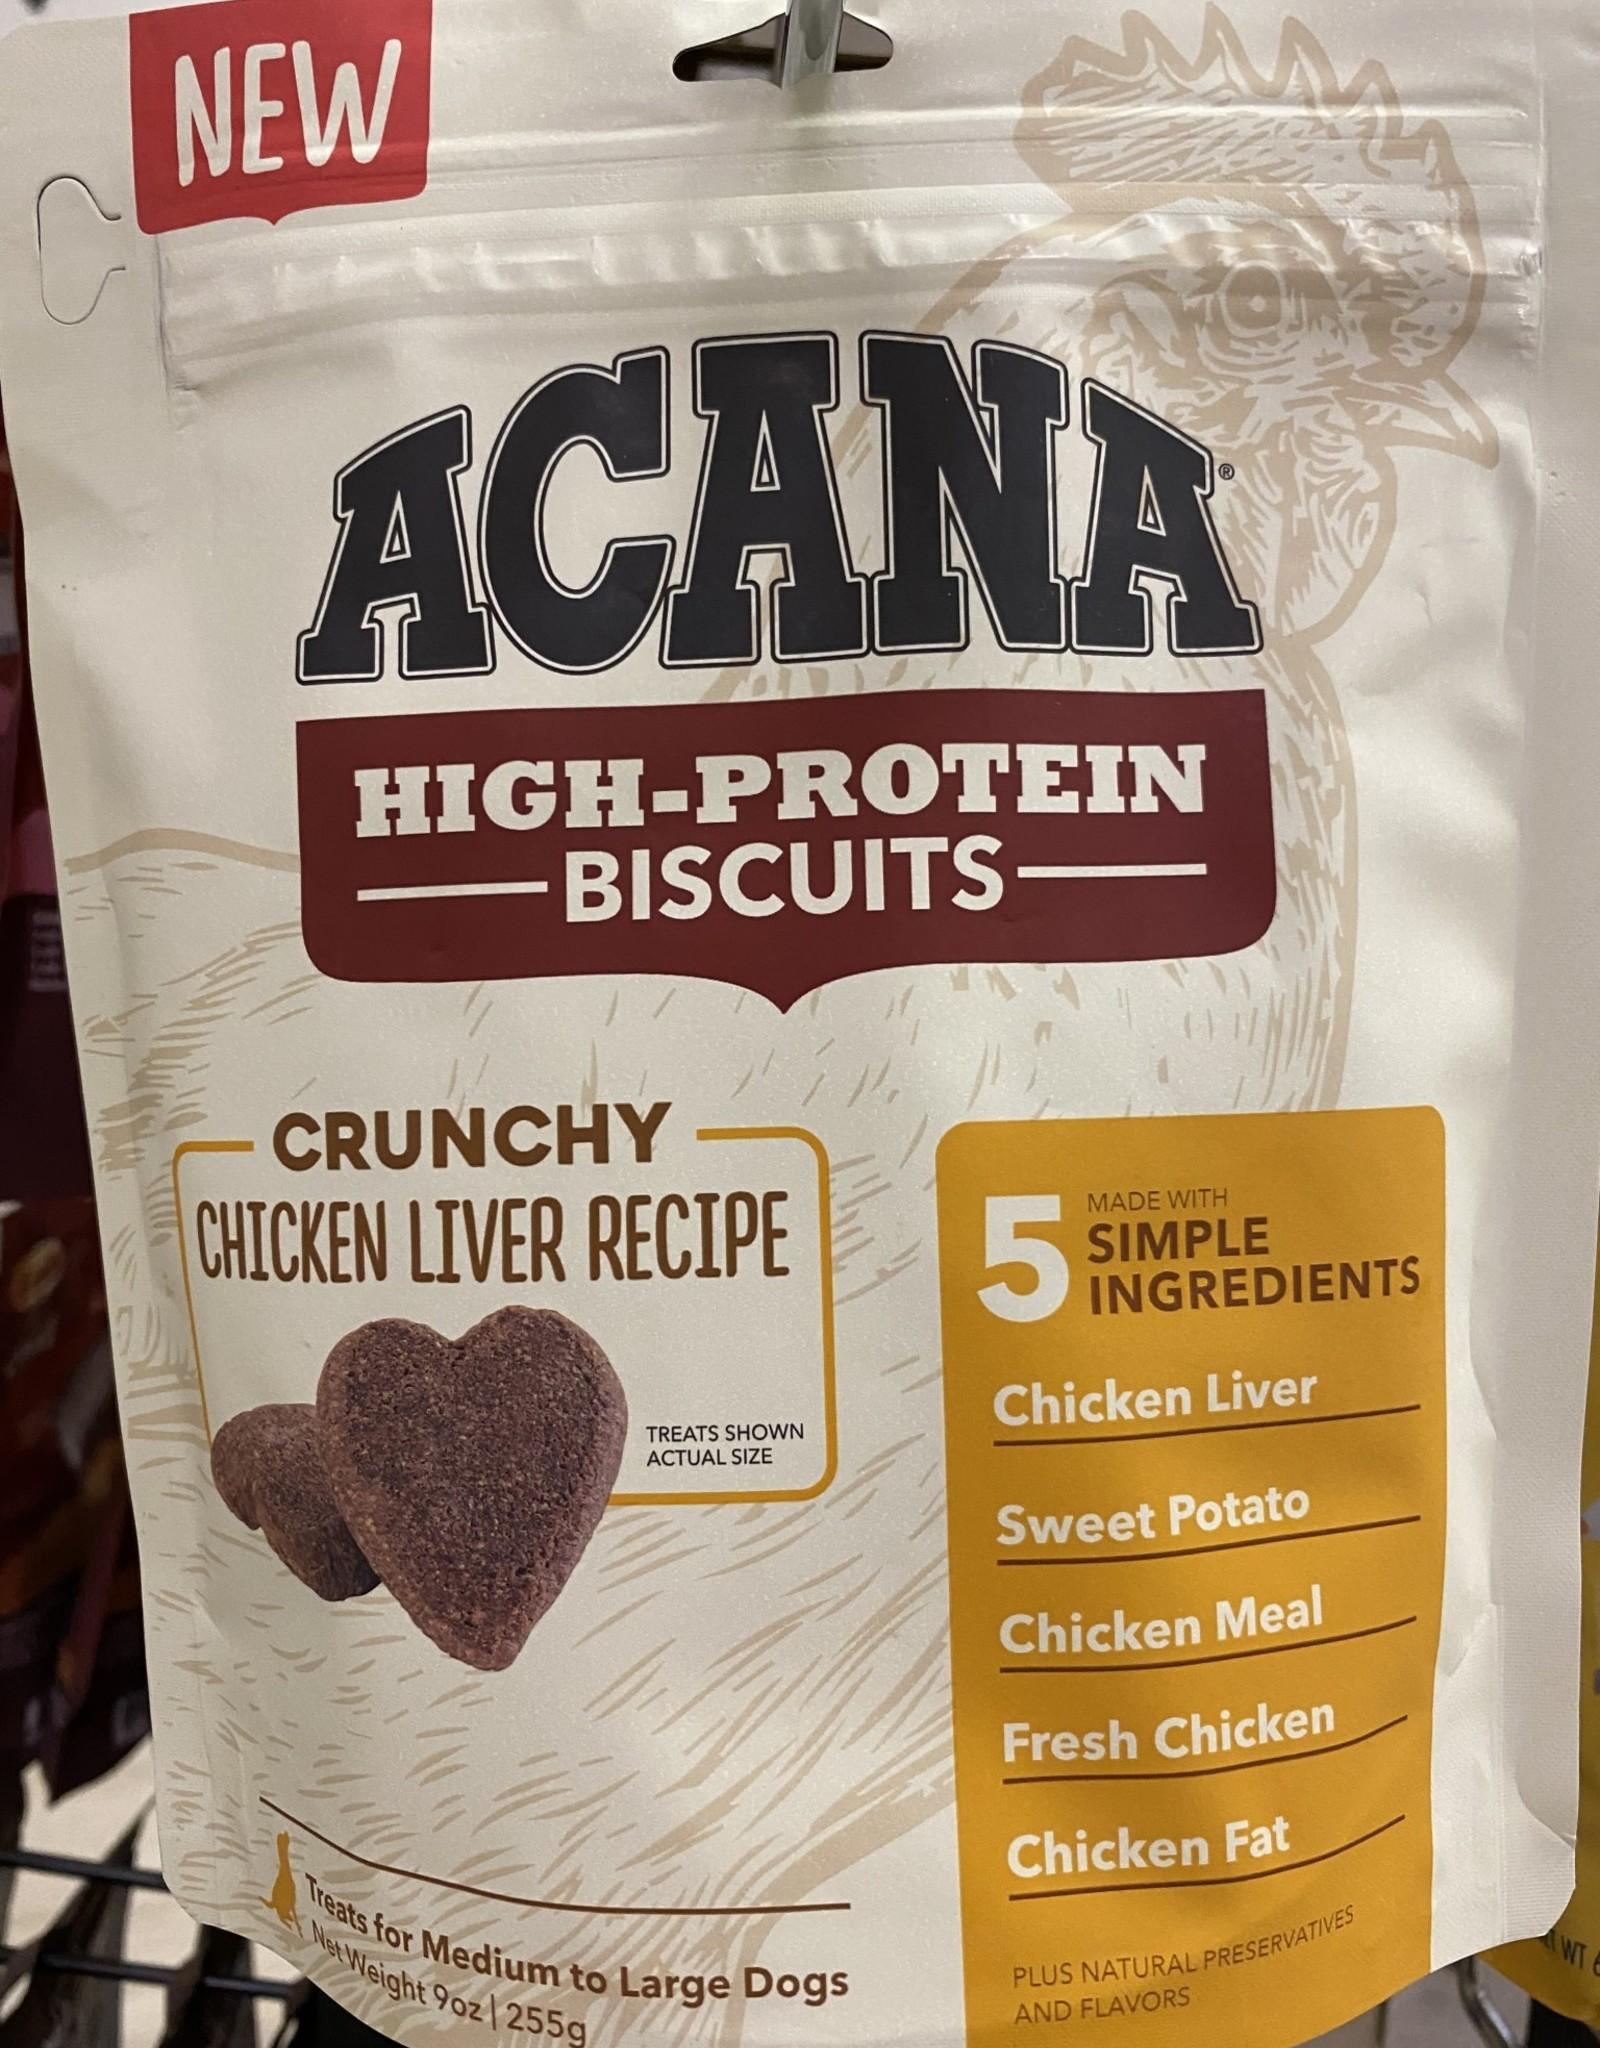 Acana Chicken Liver Biscuits 9oz